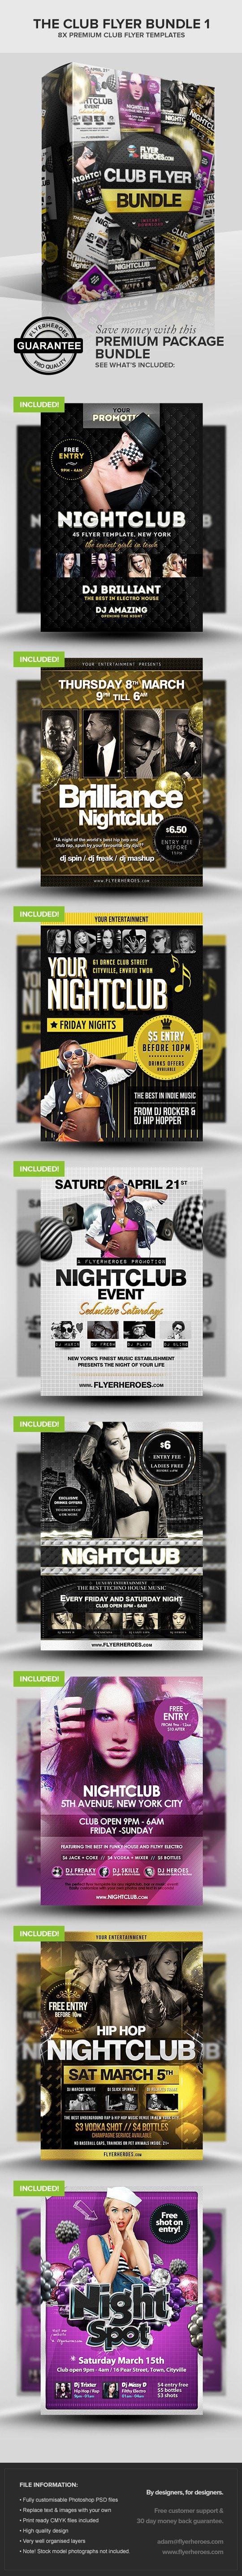 The Club Flyer Bundle 1